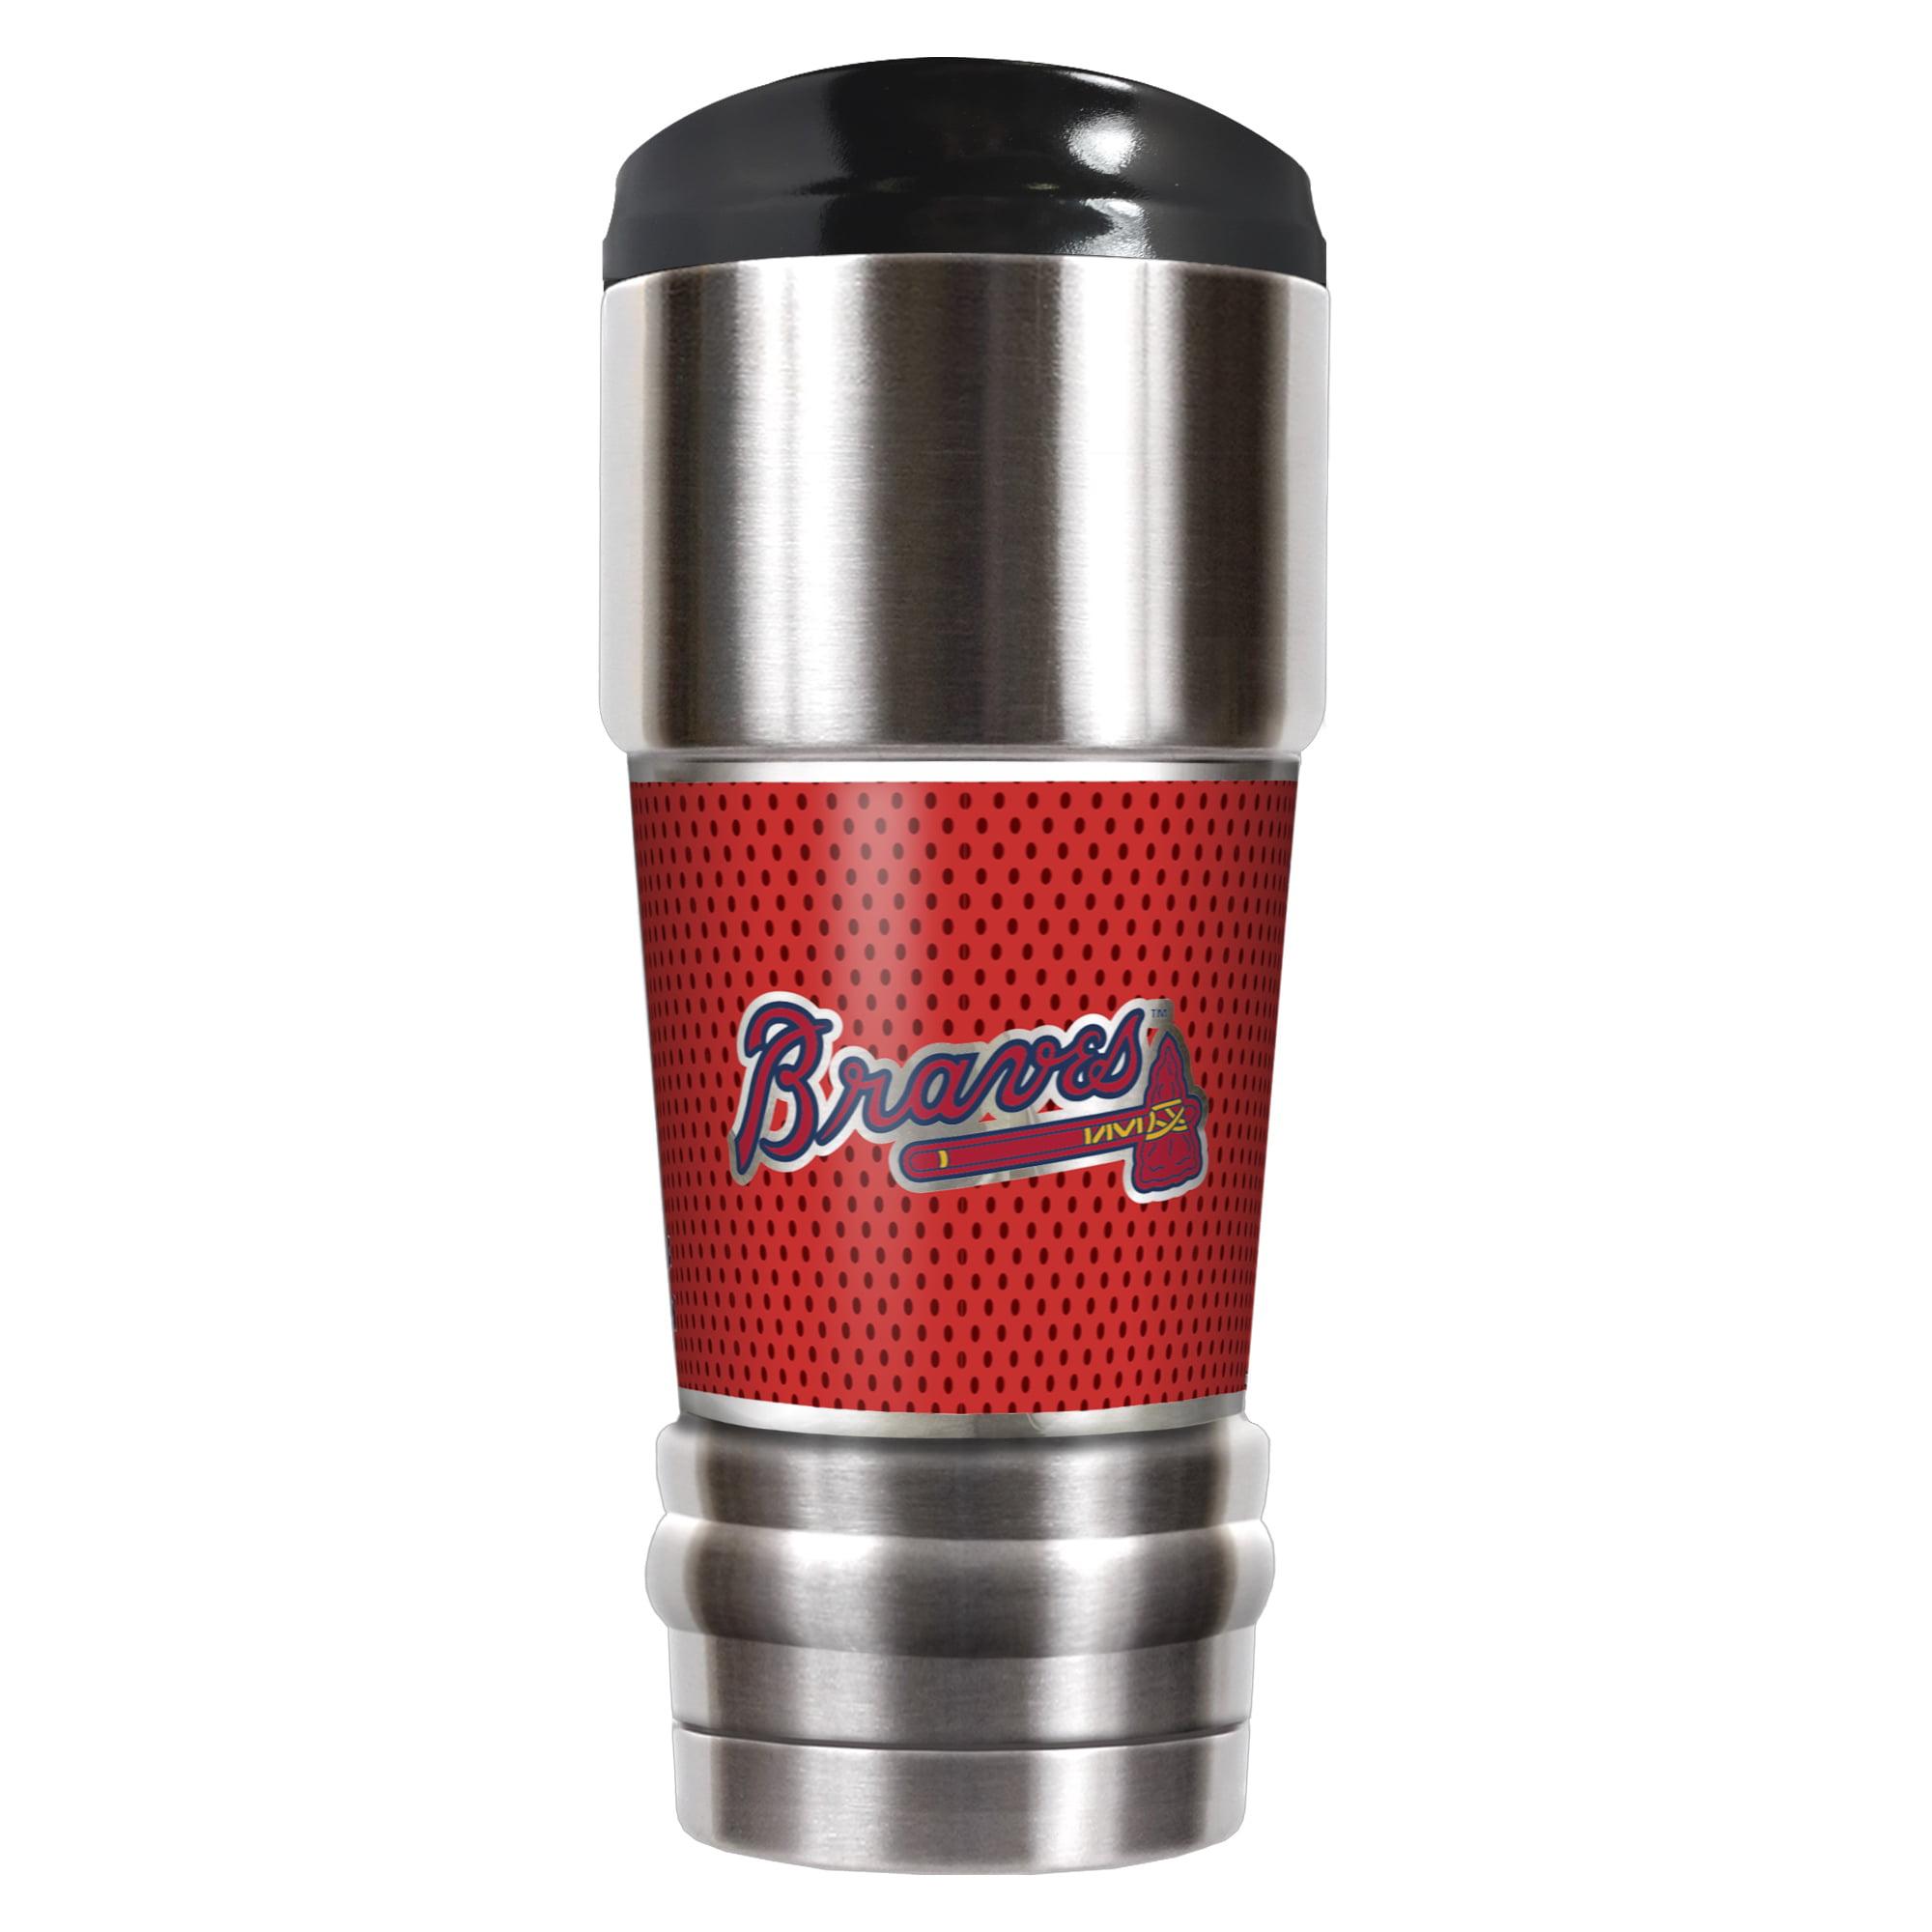 Atlanta Braves 2018 Players' Weekend 18oz. Vacuum-Insulated Travel Mug - No Size